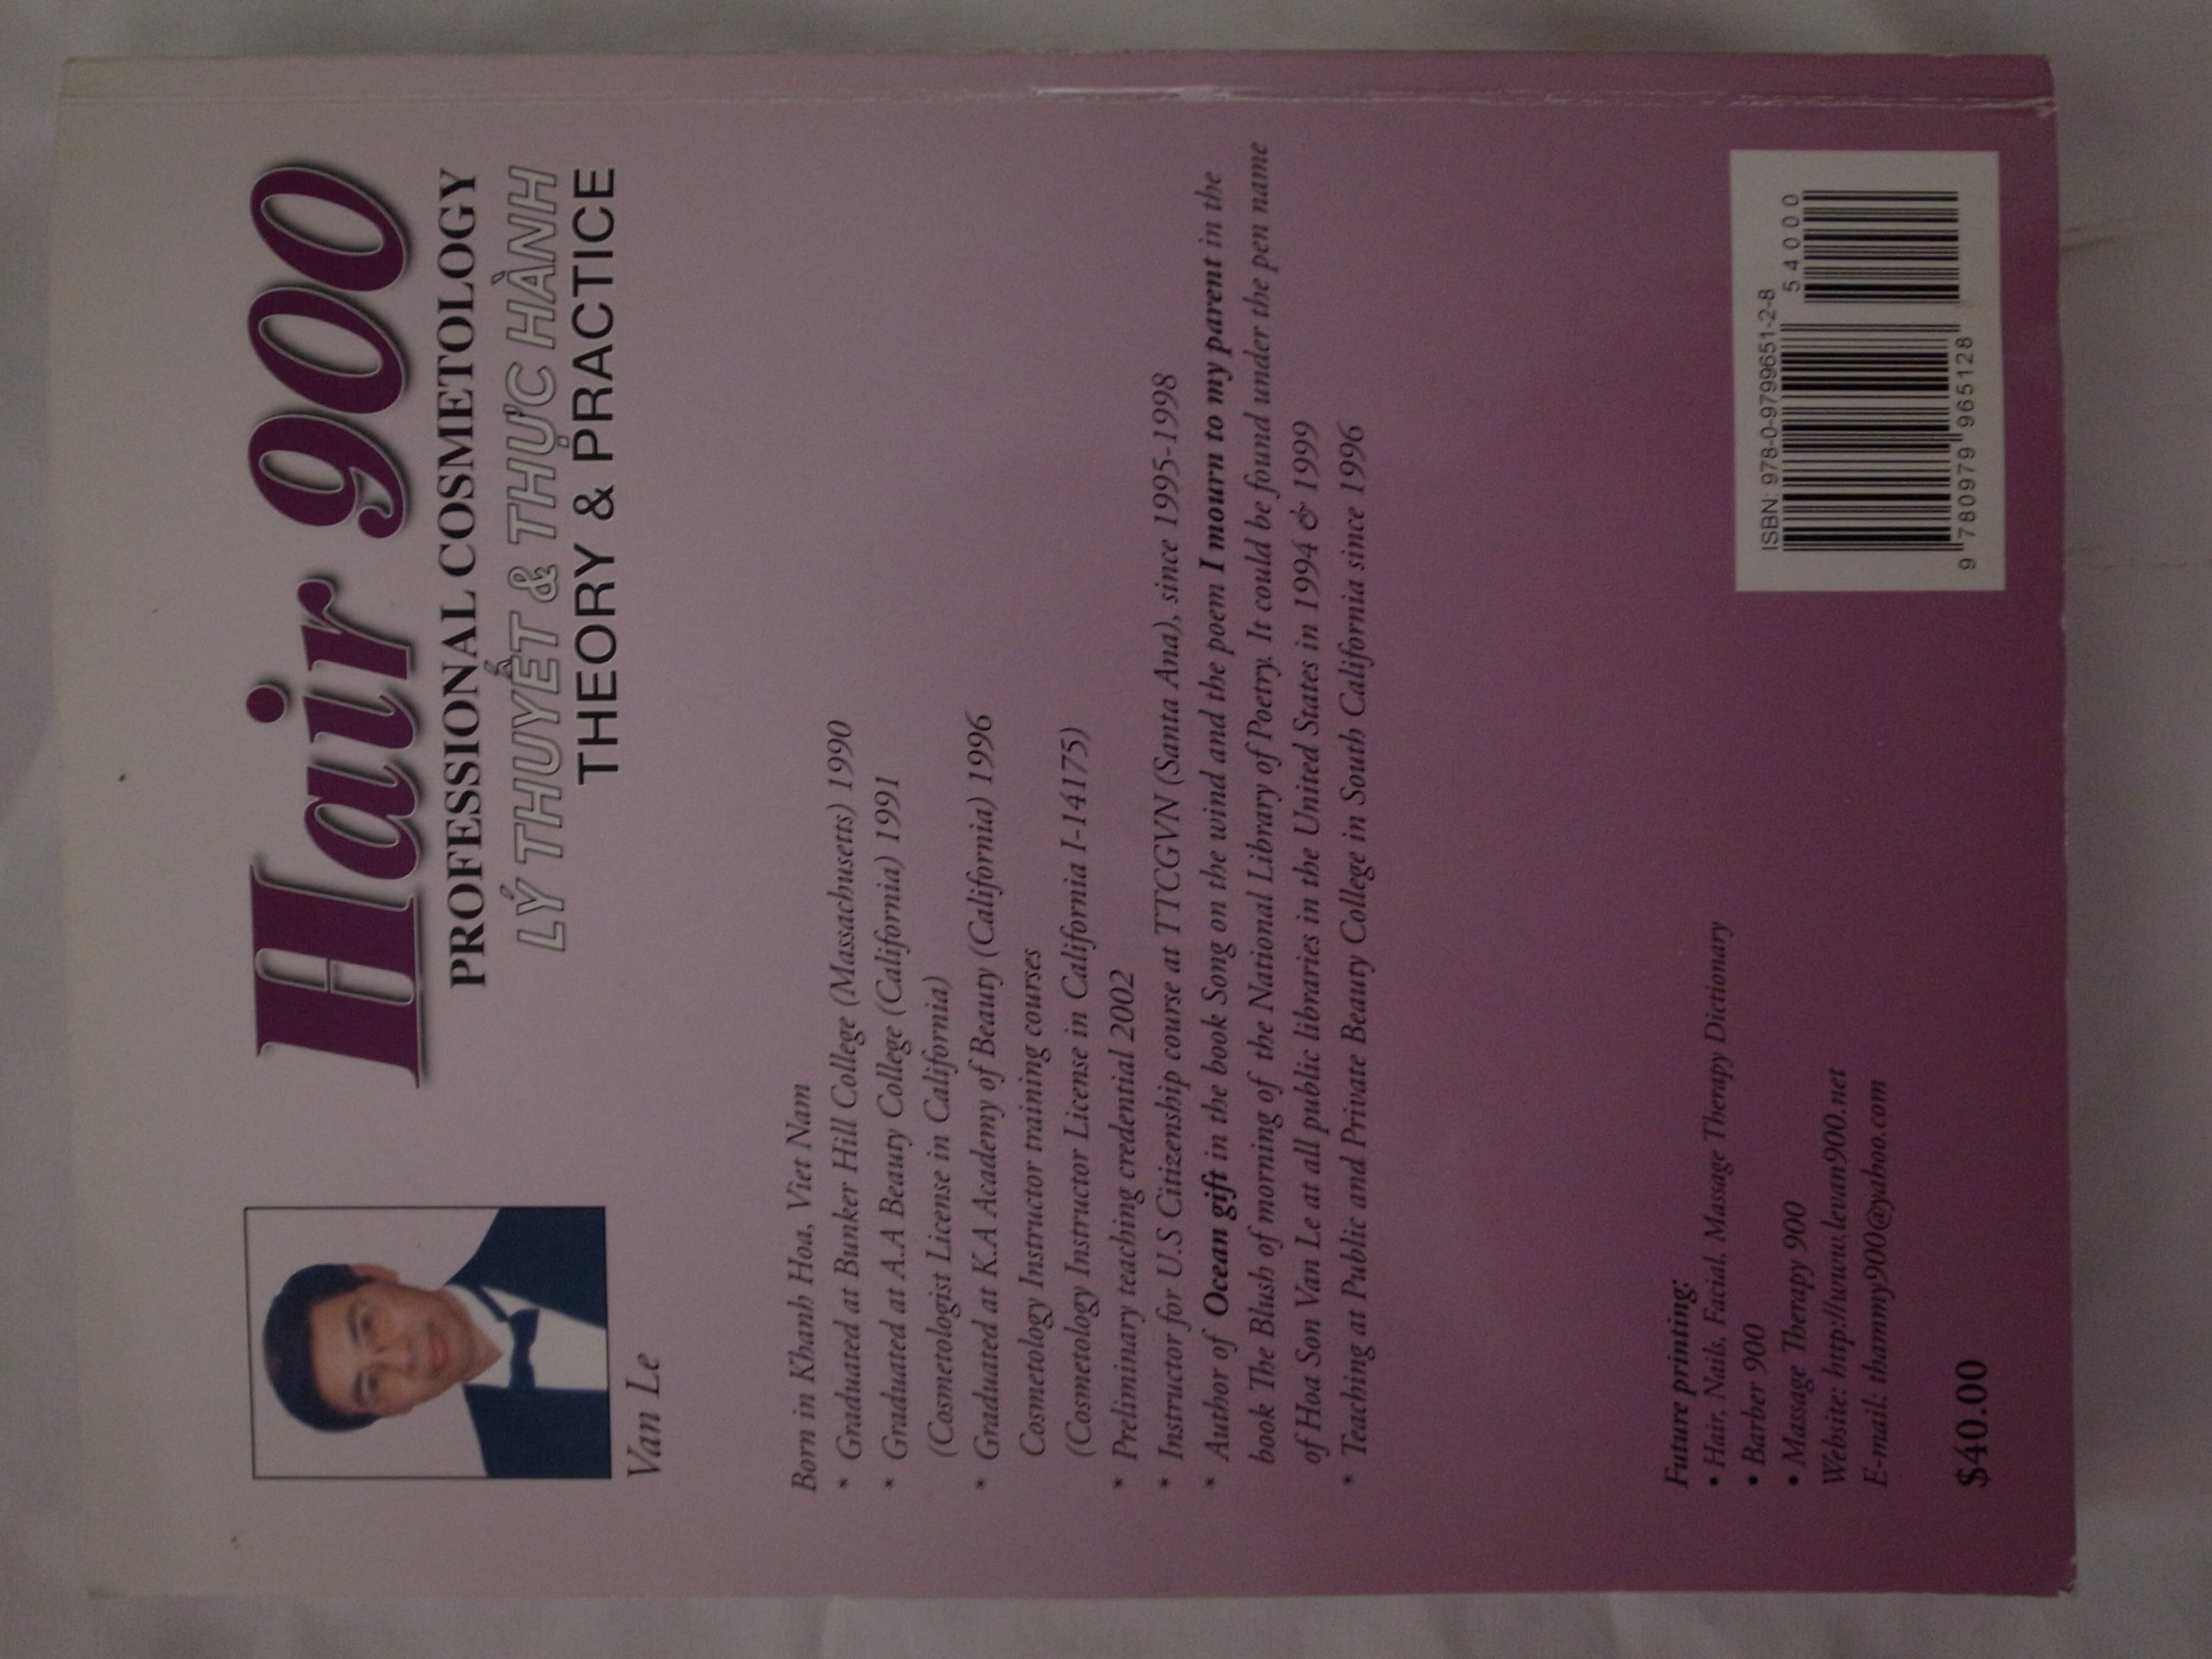 Hair 900 professional cosmetology theory practice van le hair 900 professional cosmetology theory practice van le 9780979965128 amazon books fandeluxe Gallery